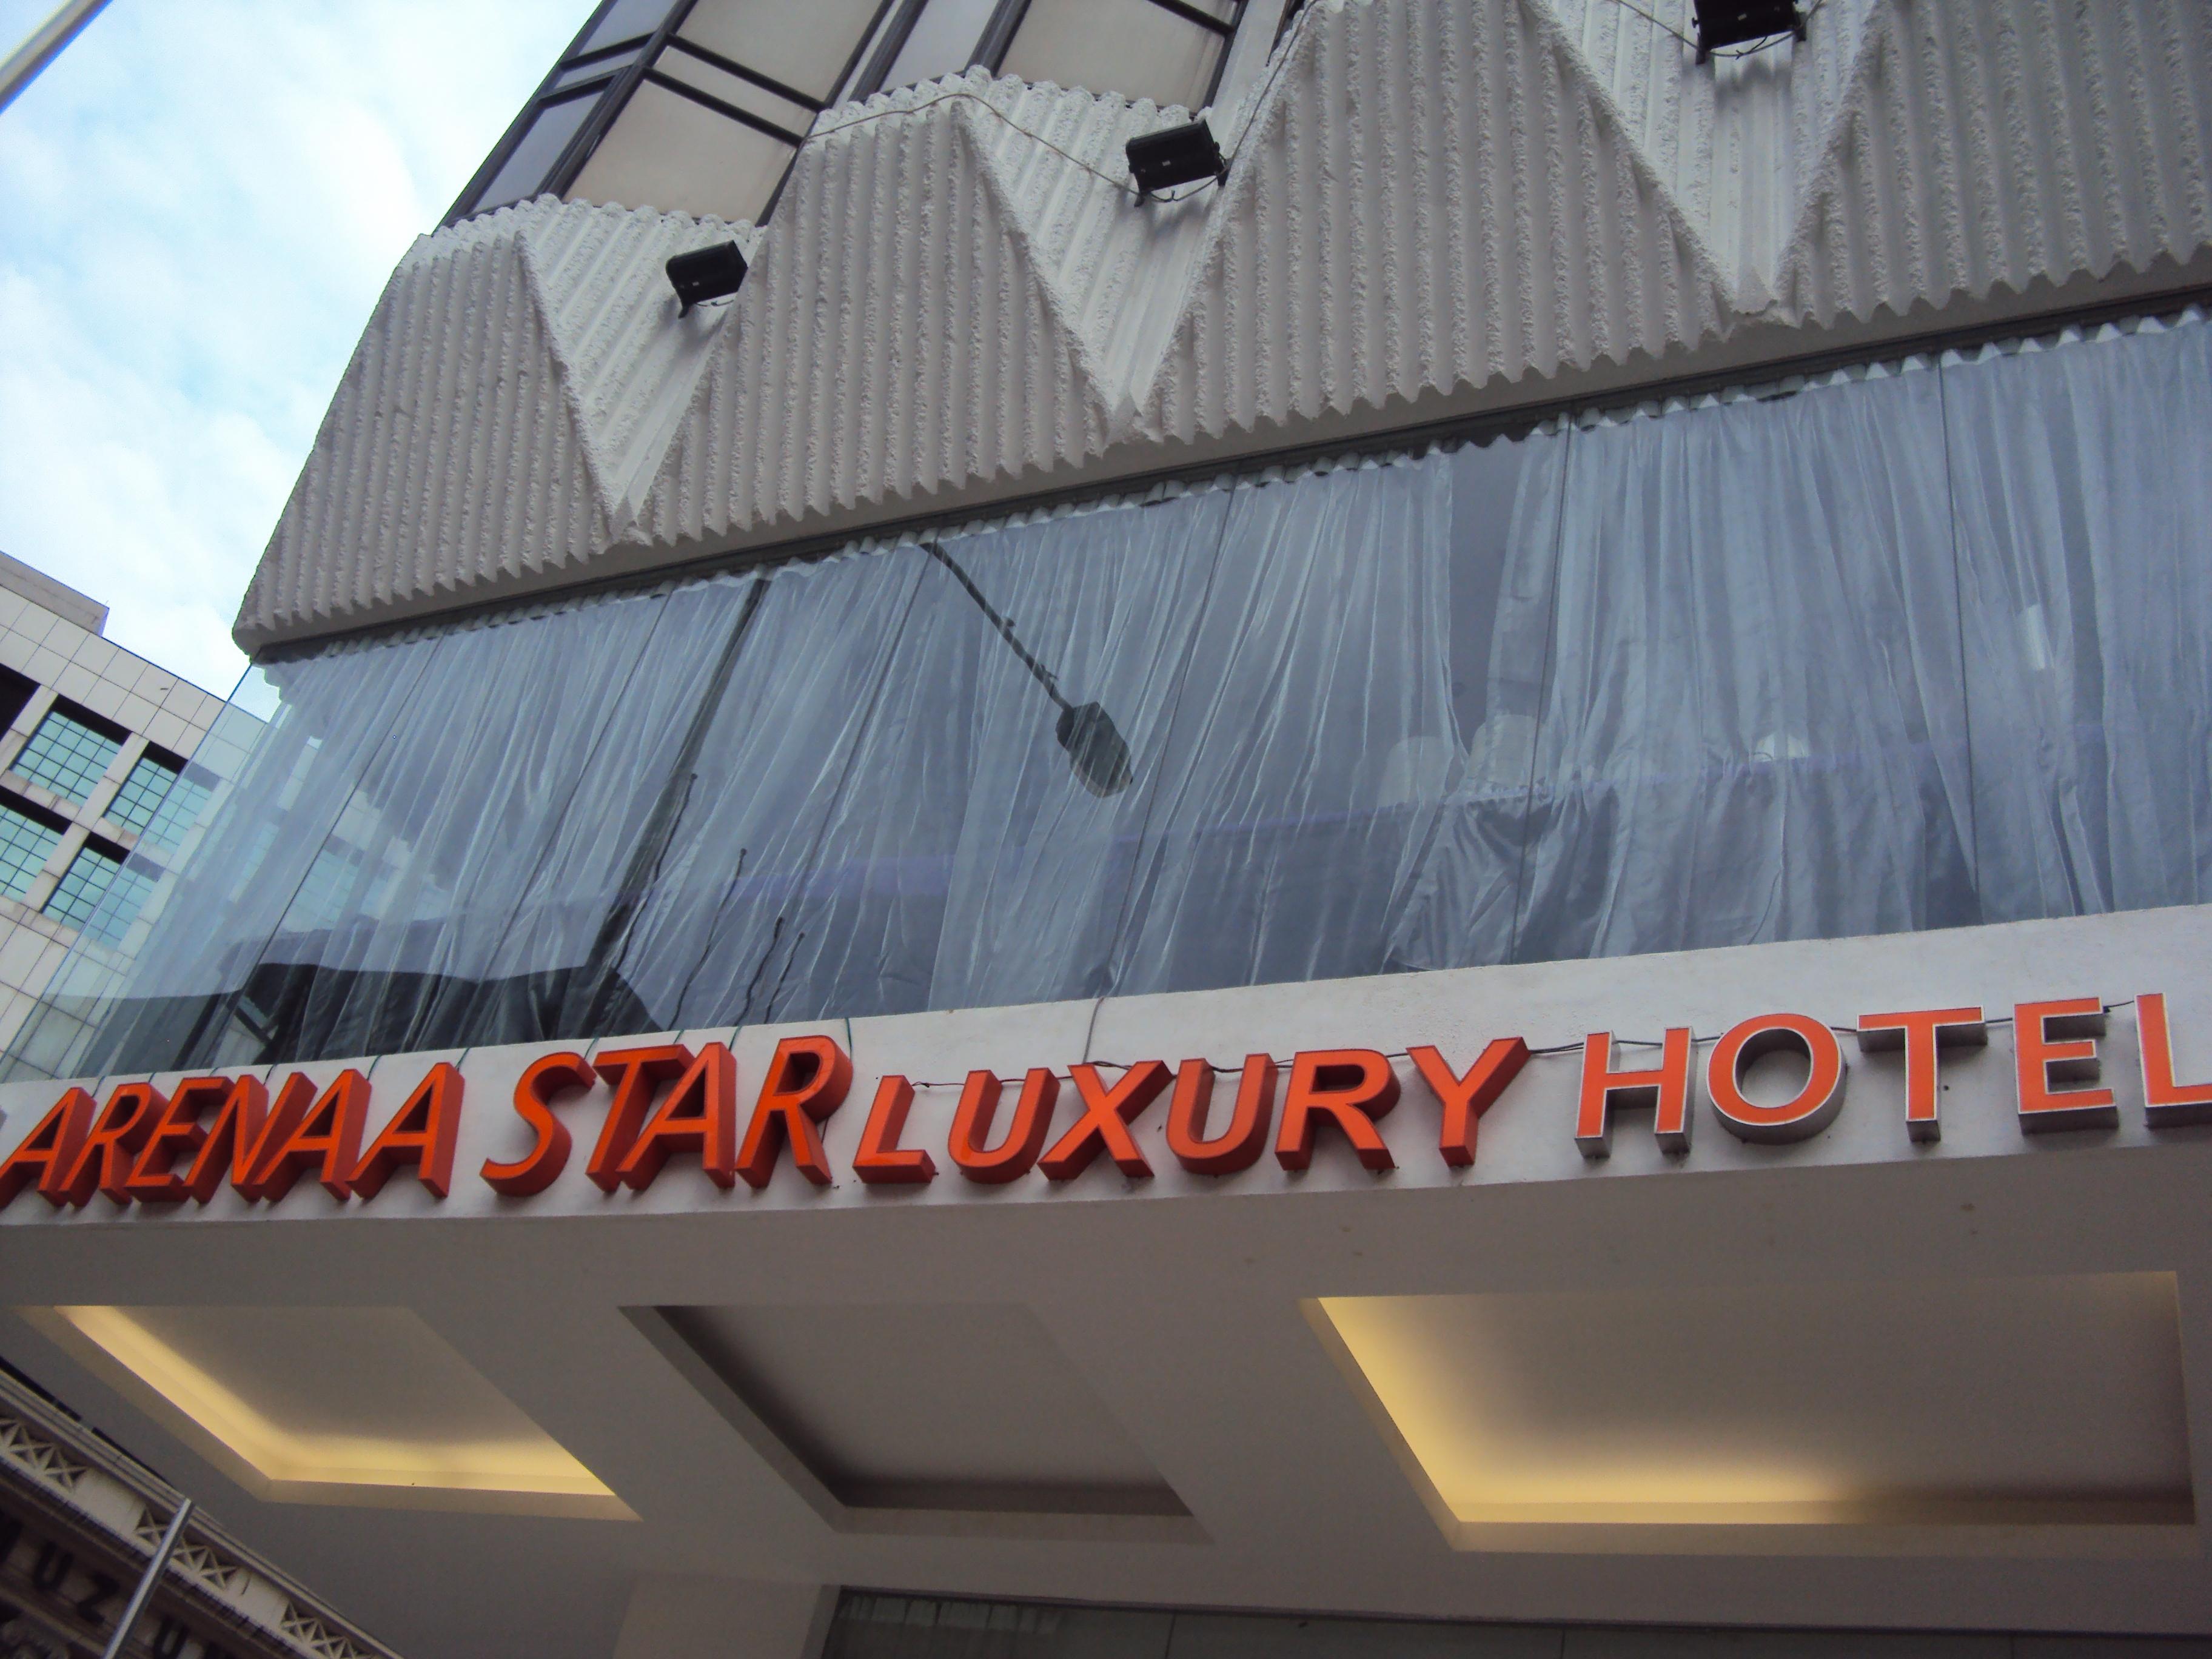 Arenaa Star Luxury Hotel Ridha S Personal Blog